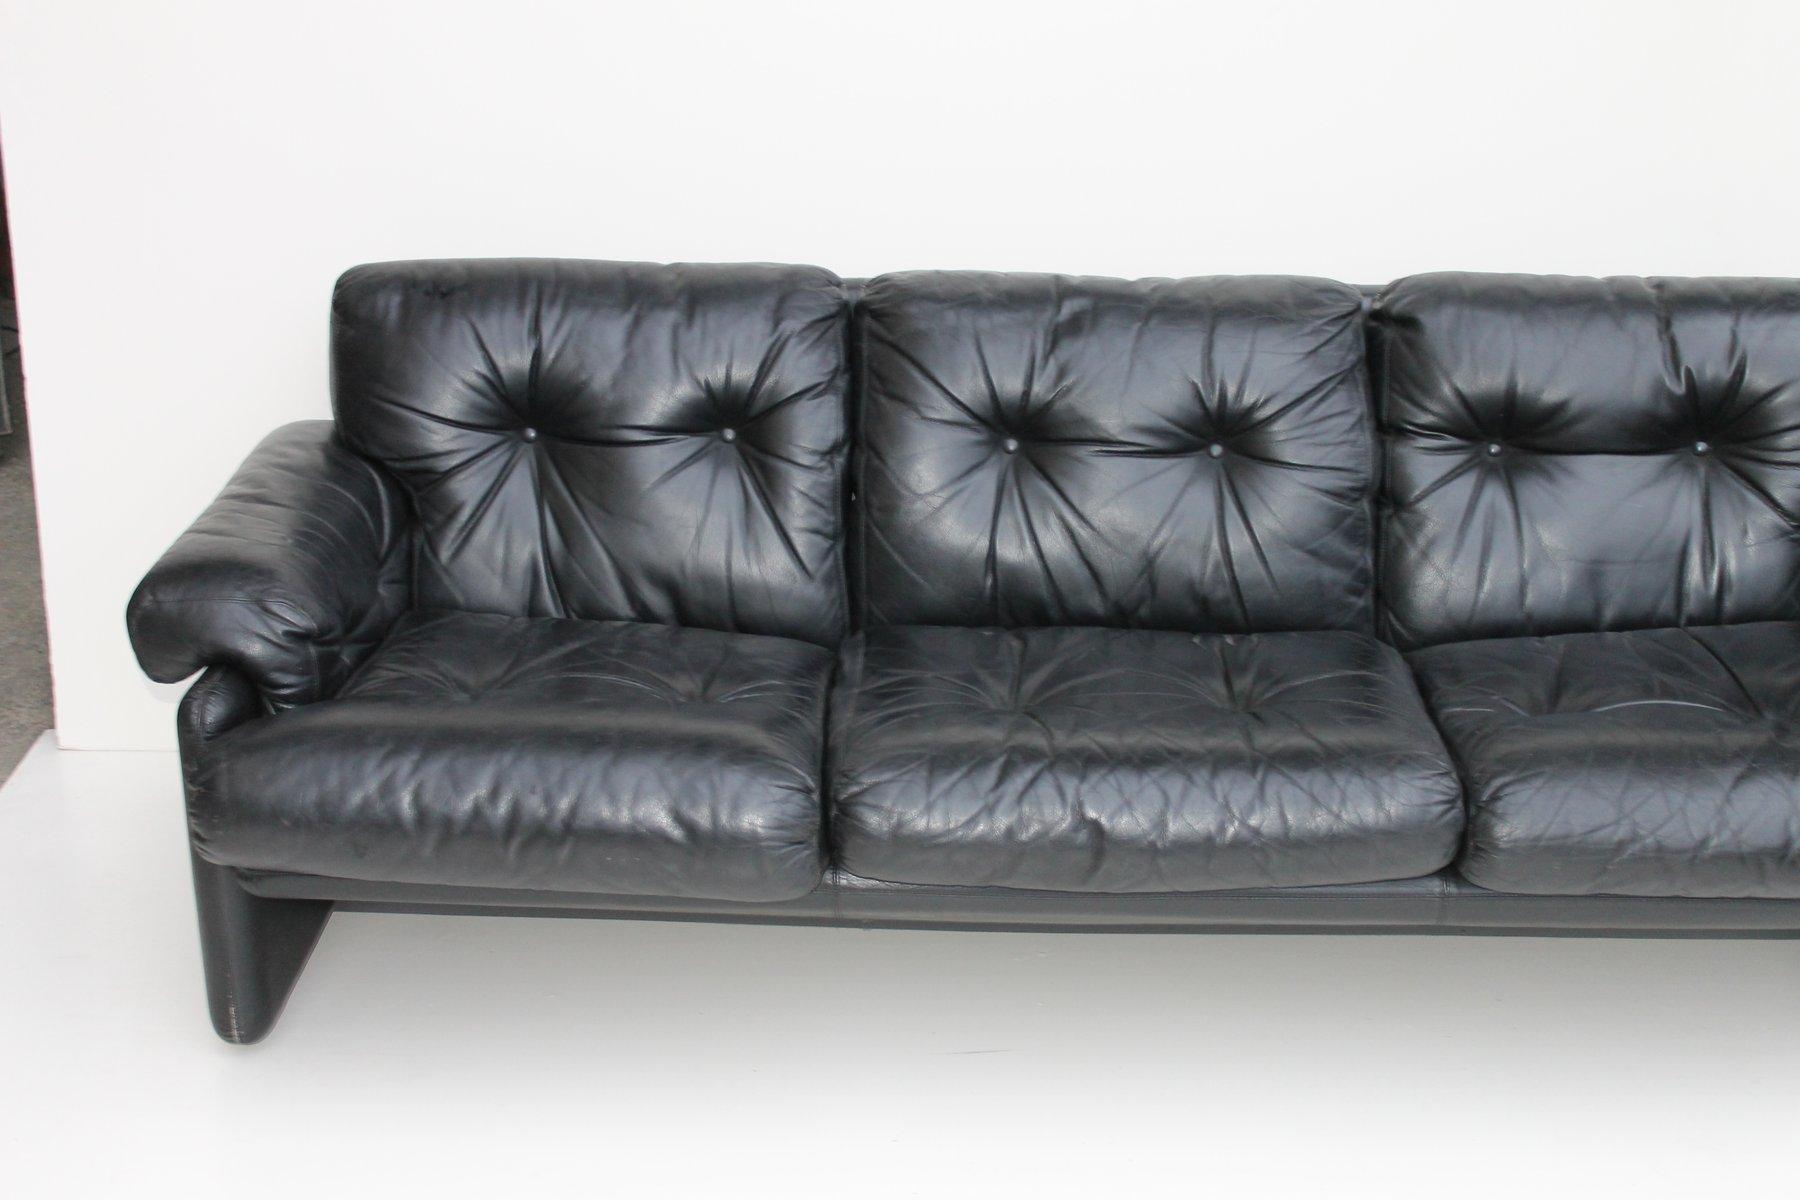 Coronado Black Leather Sofa by Tobia Scarpa for B&B Italia 1970s